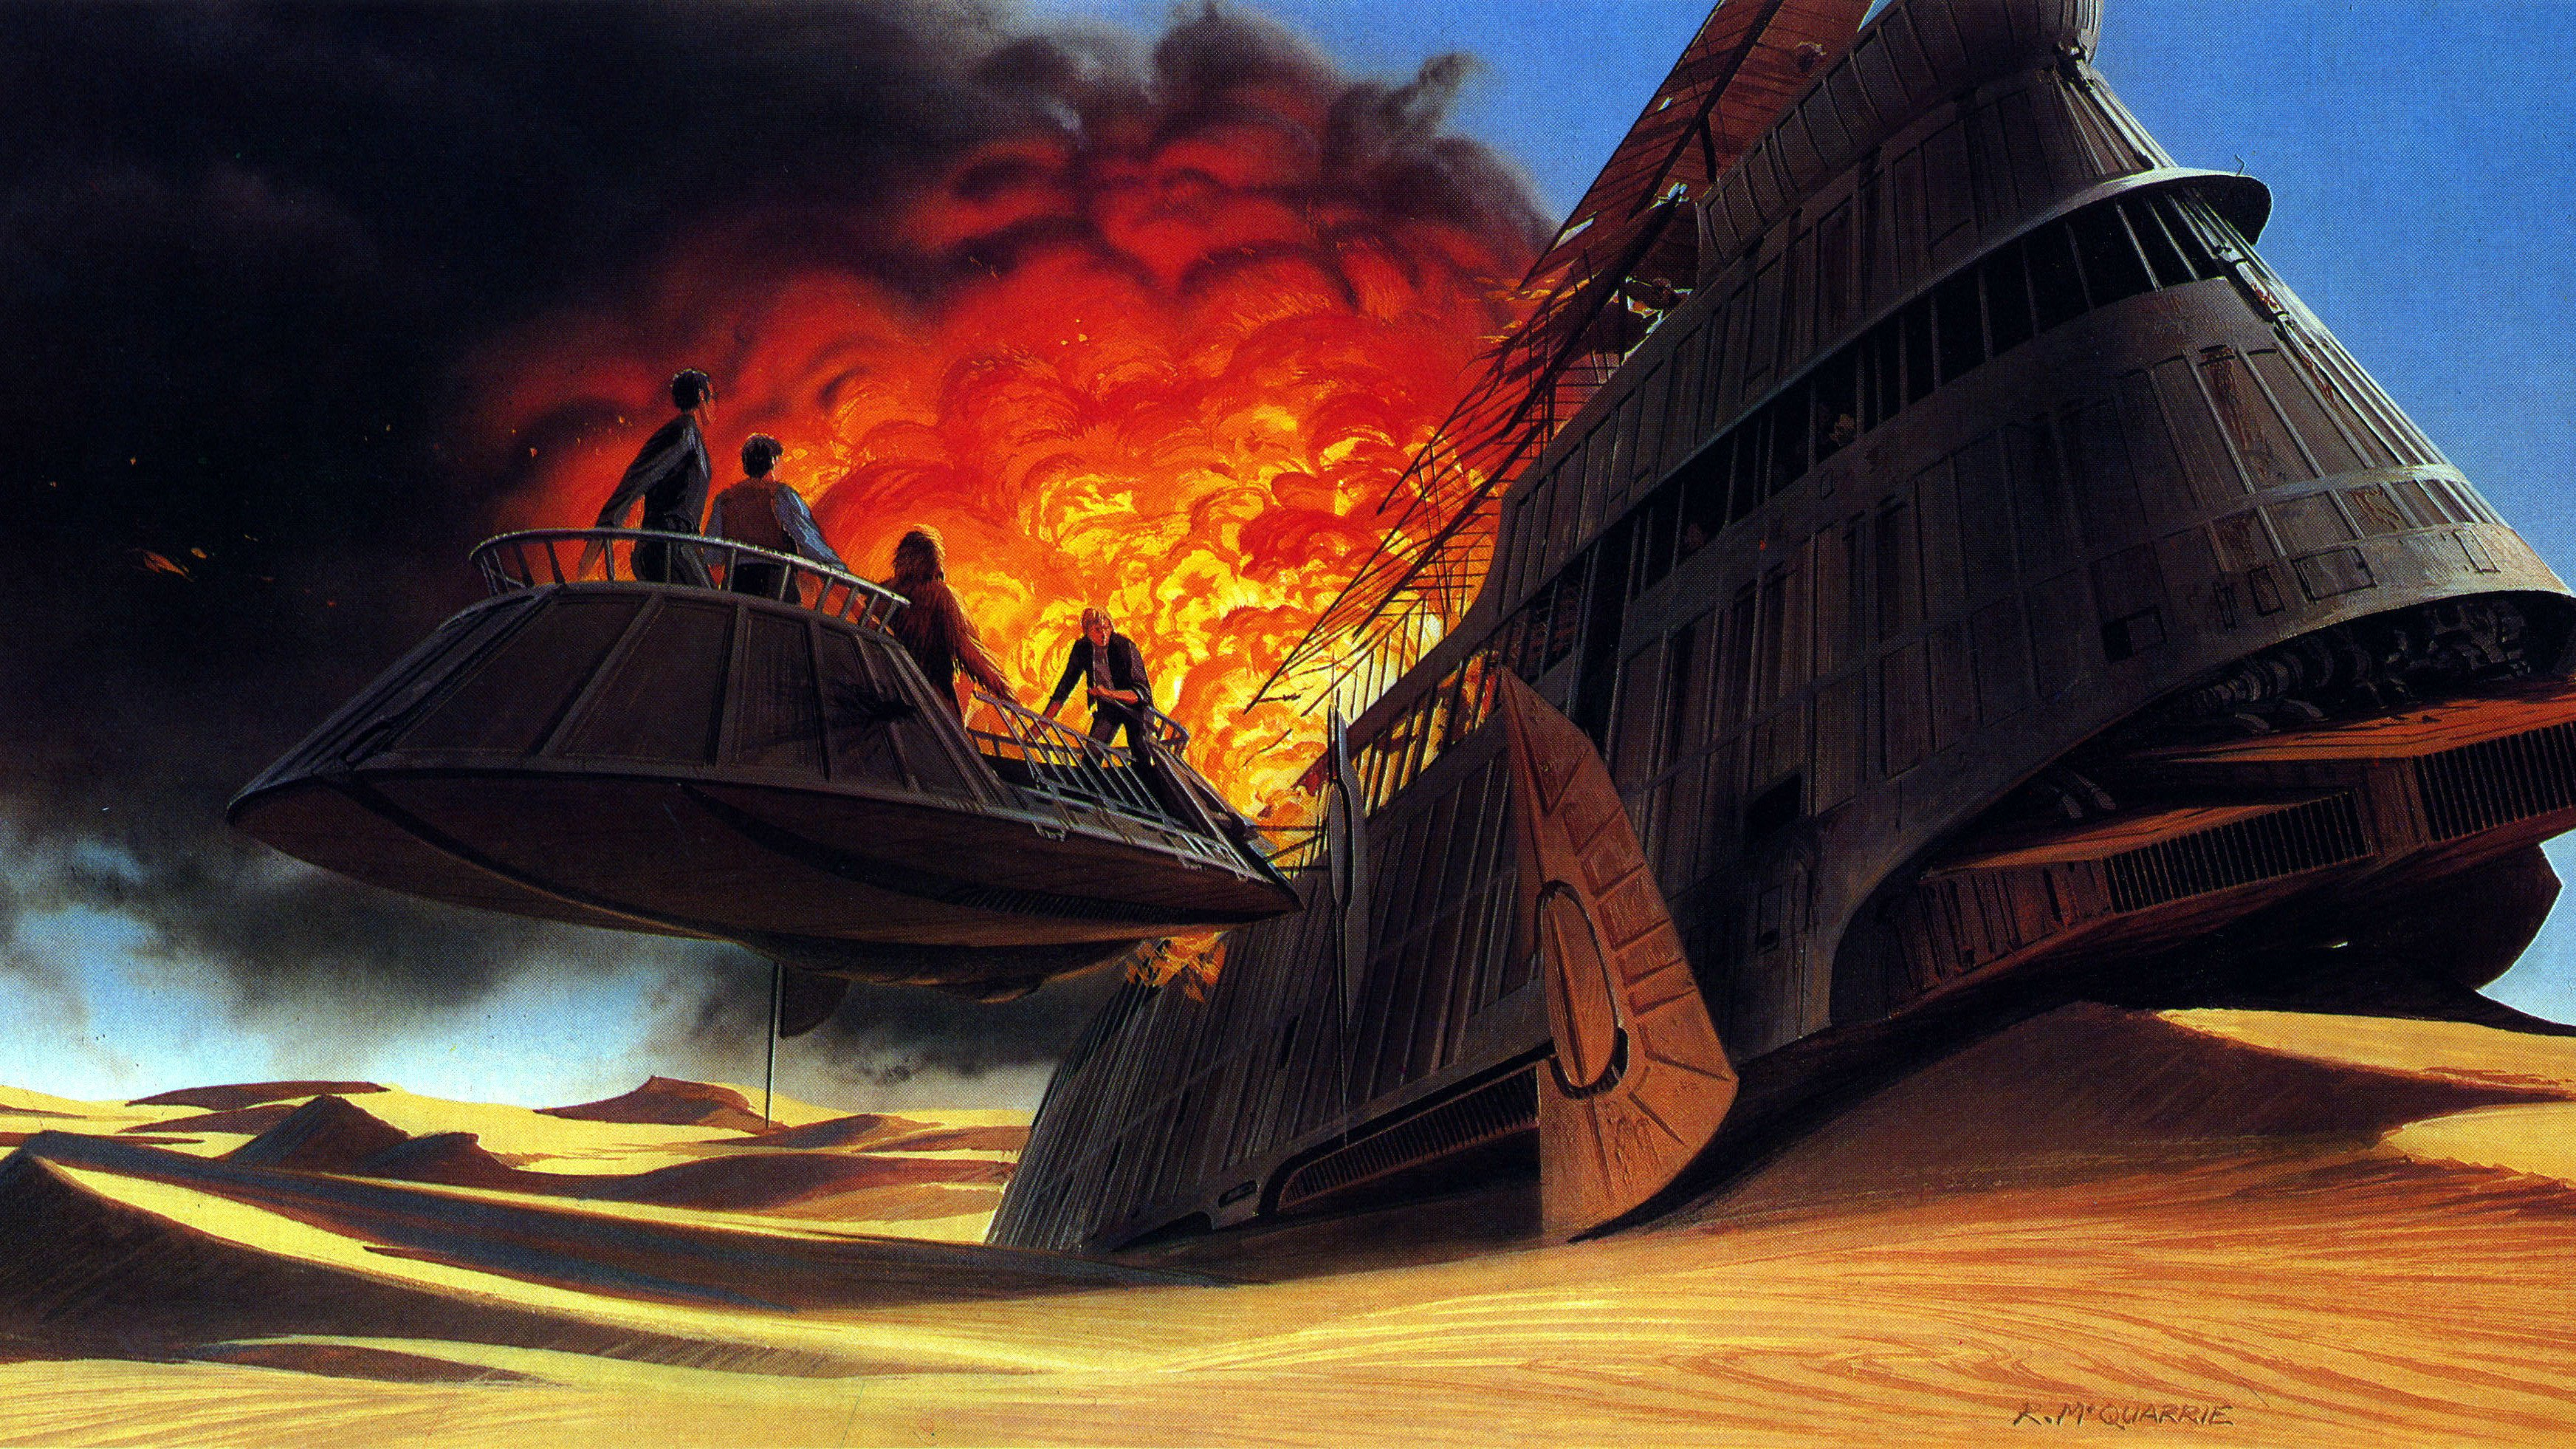 Star Wars Episode VI: Return Of The Jedi Wallpapers